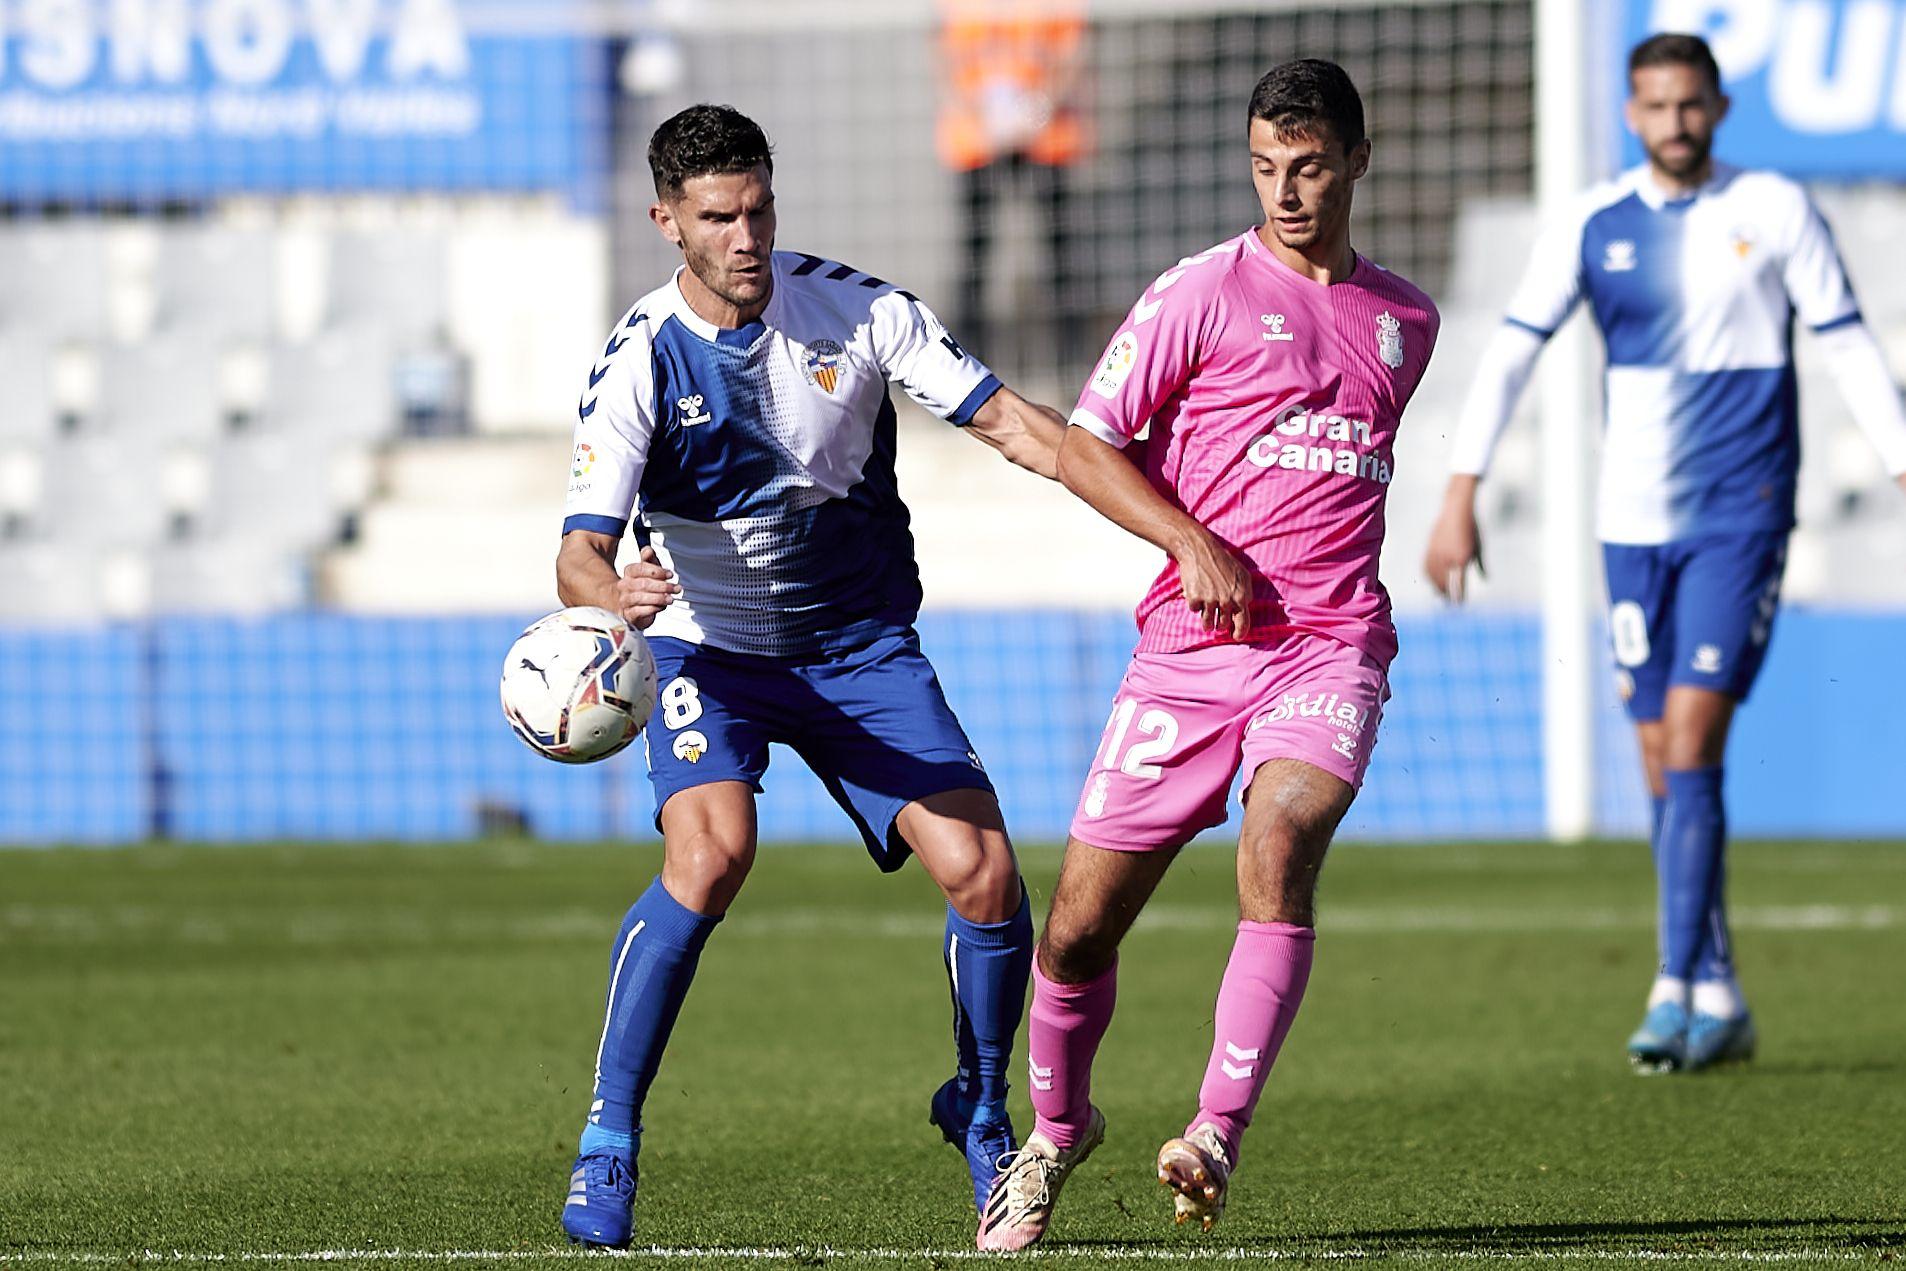 Liga Smartbank: C.D. Sabadell - UD Las Palmas